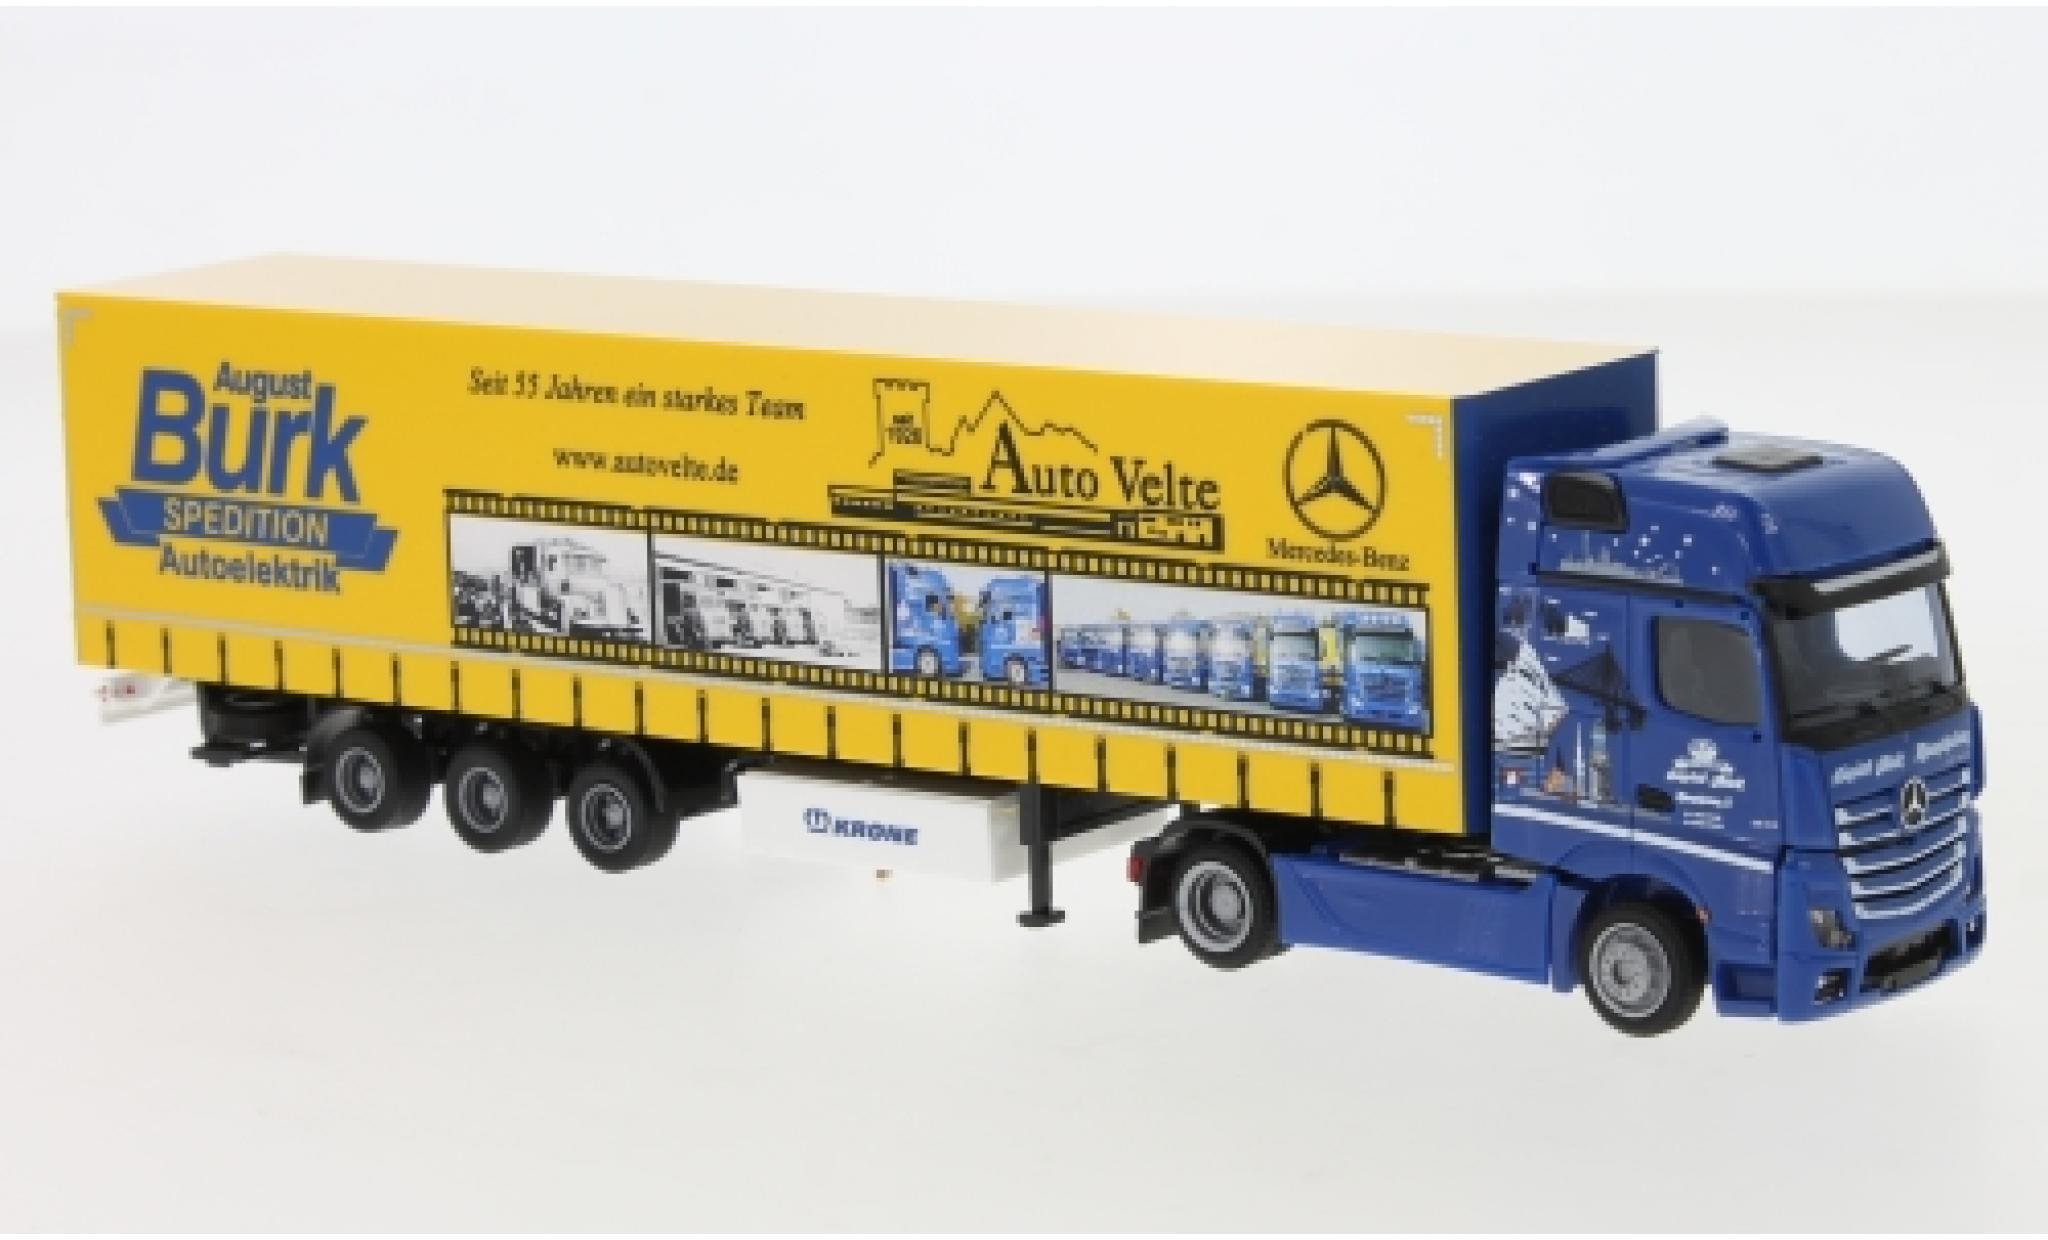 Mercedes Actros 1/87 AWM 2 Giga./Aerop. August Burk Spedition Mega-Gardinenplanensattelzug